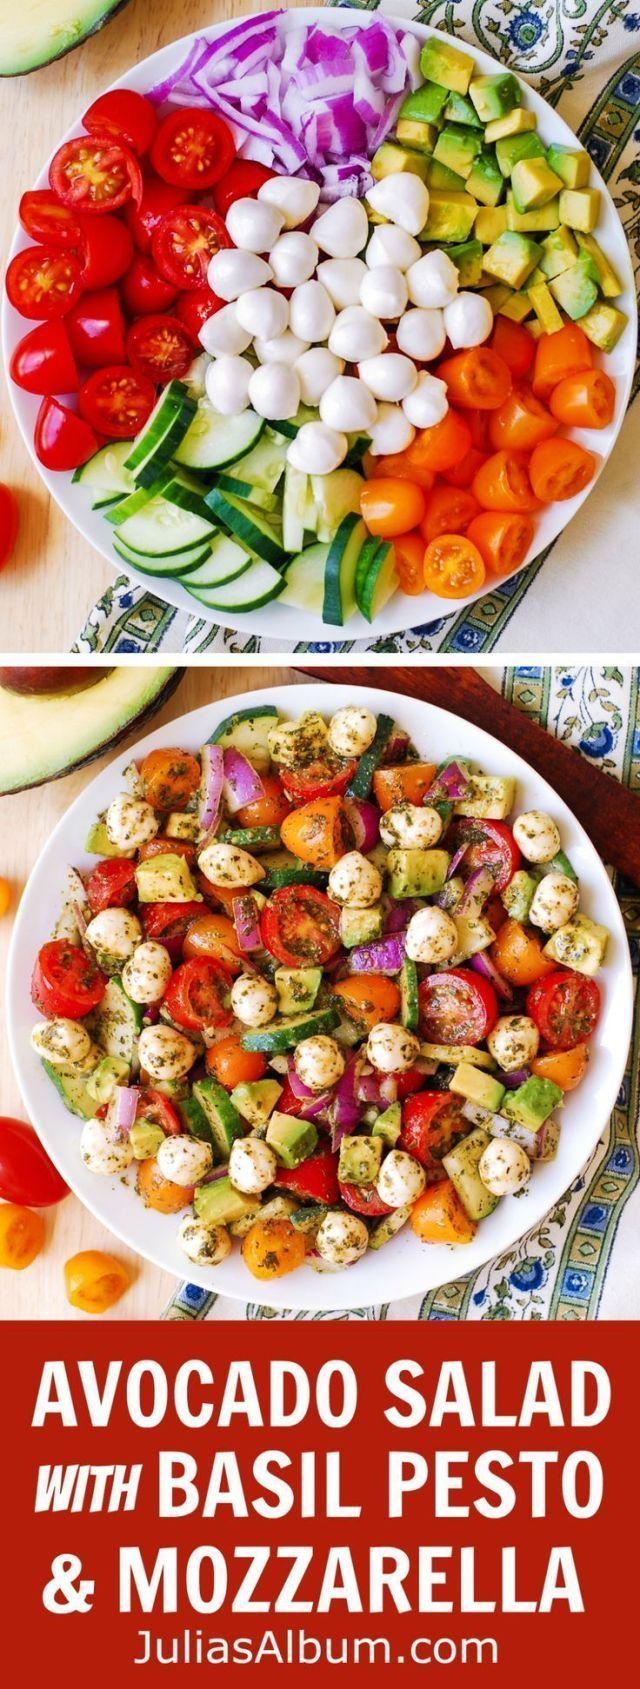 Avocadosalat mit Mozzarella, Basilikumpesto, Tomaten, Gurken #Mediterran #gesundesessen